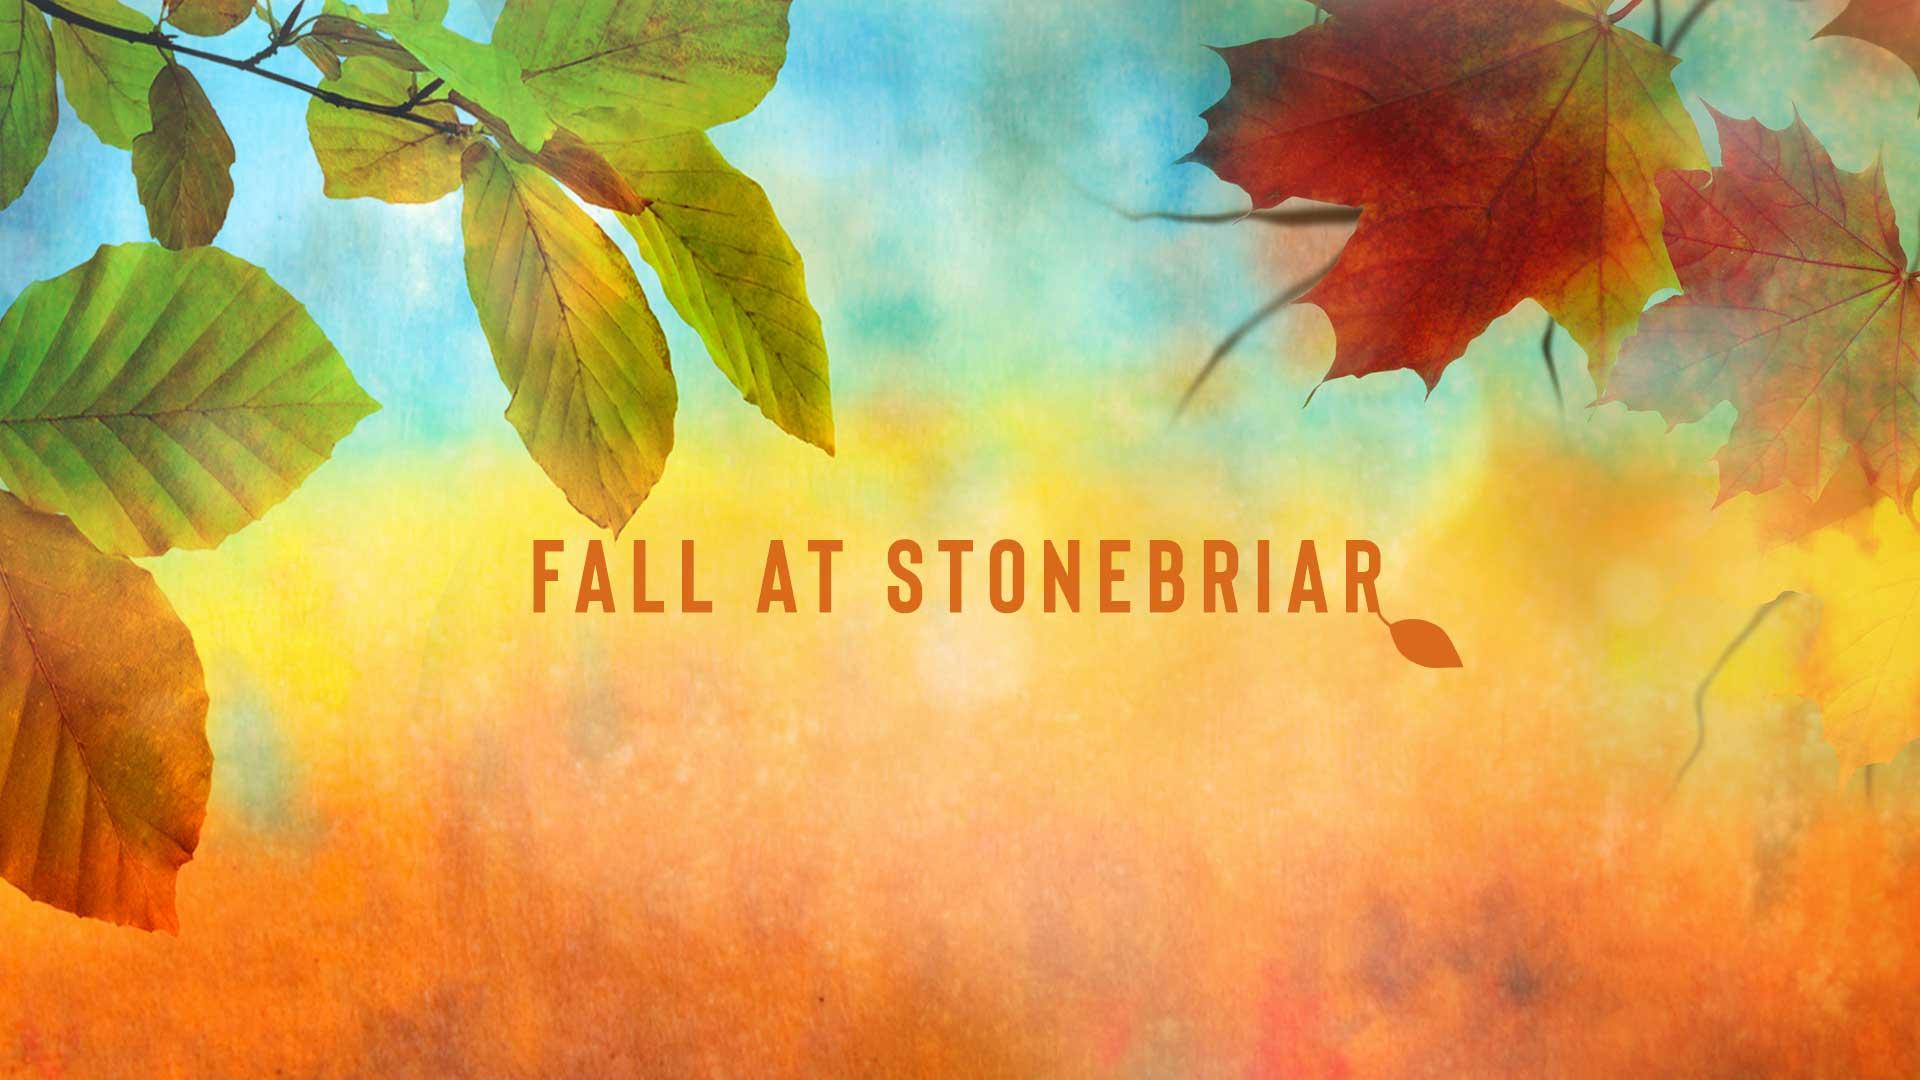 Fall Highlights at Stonebriar